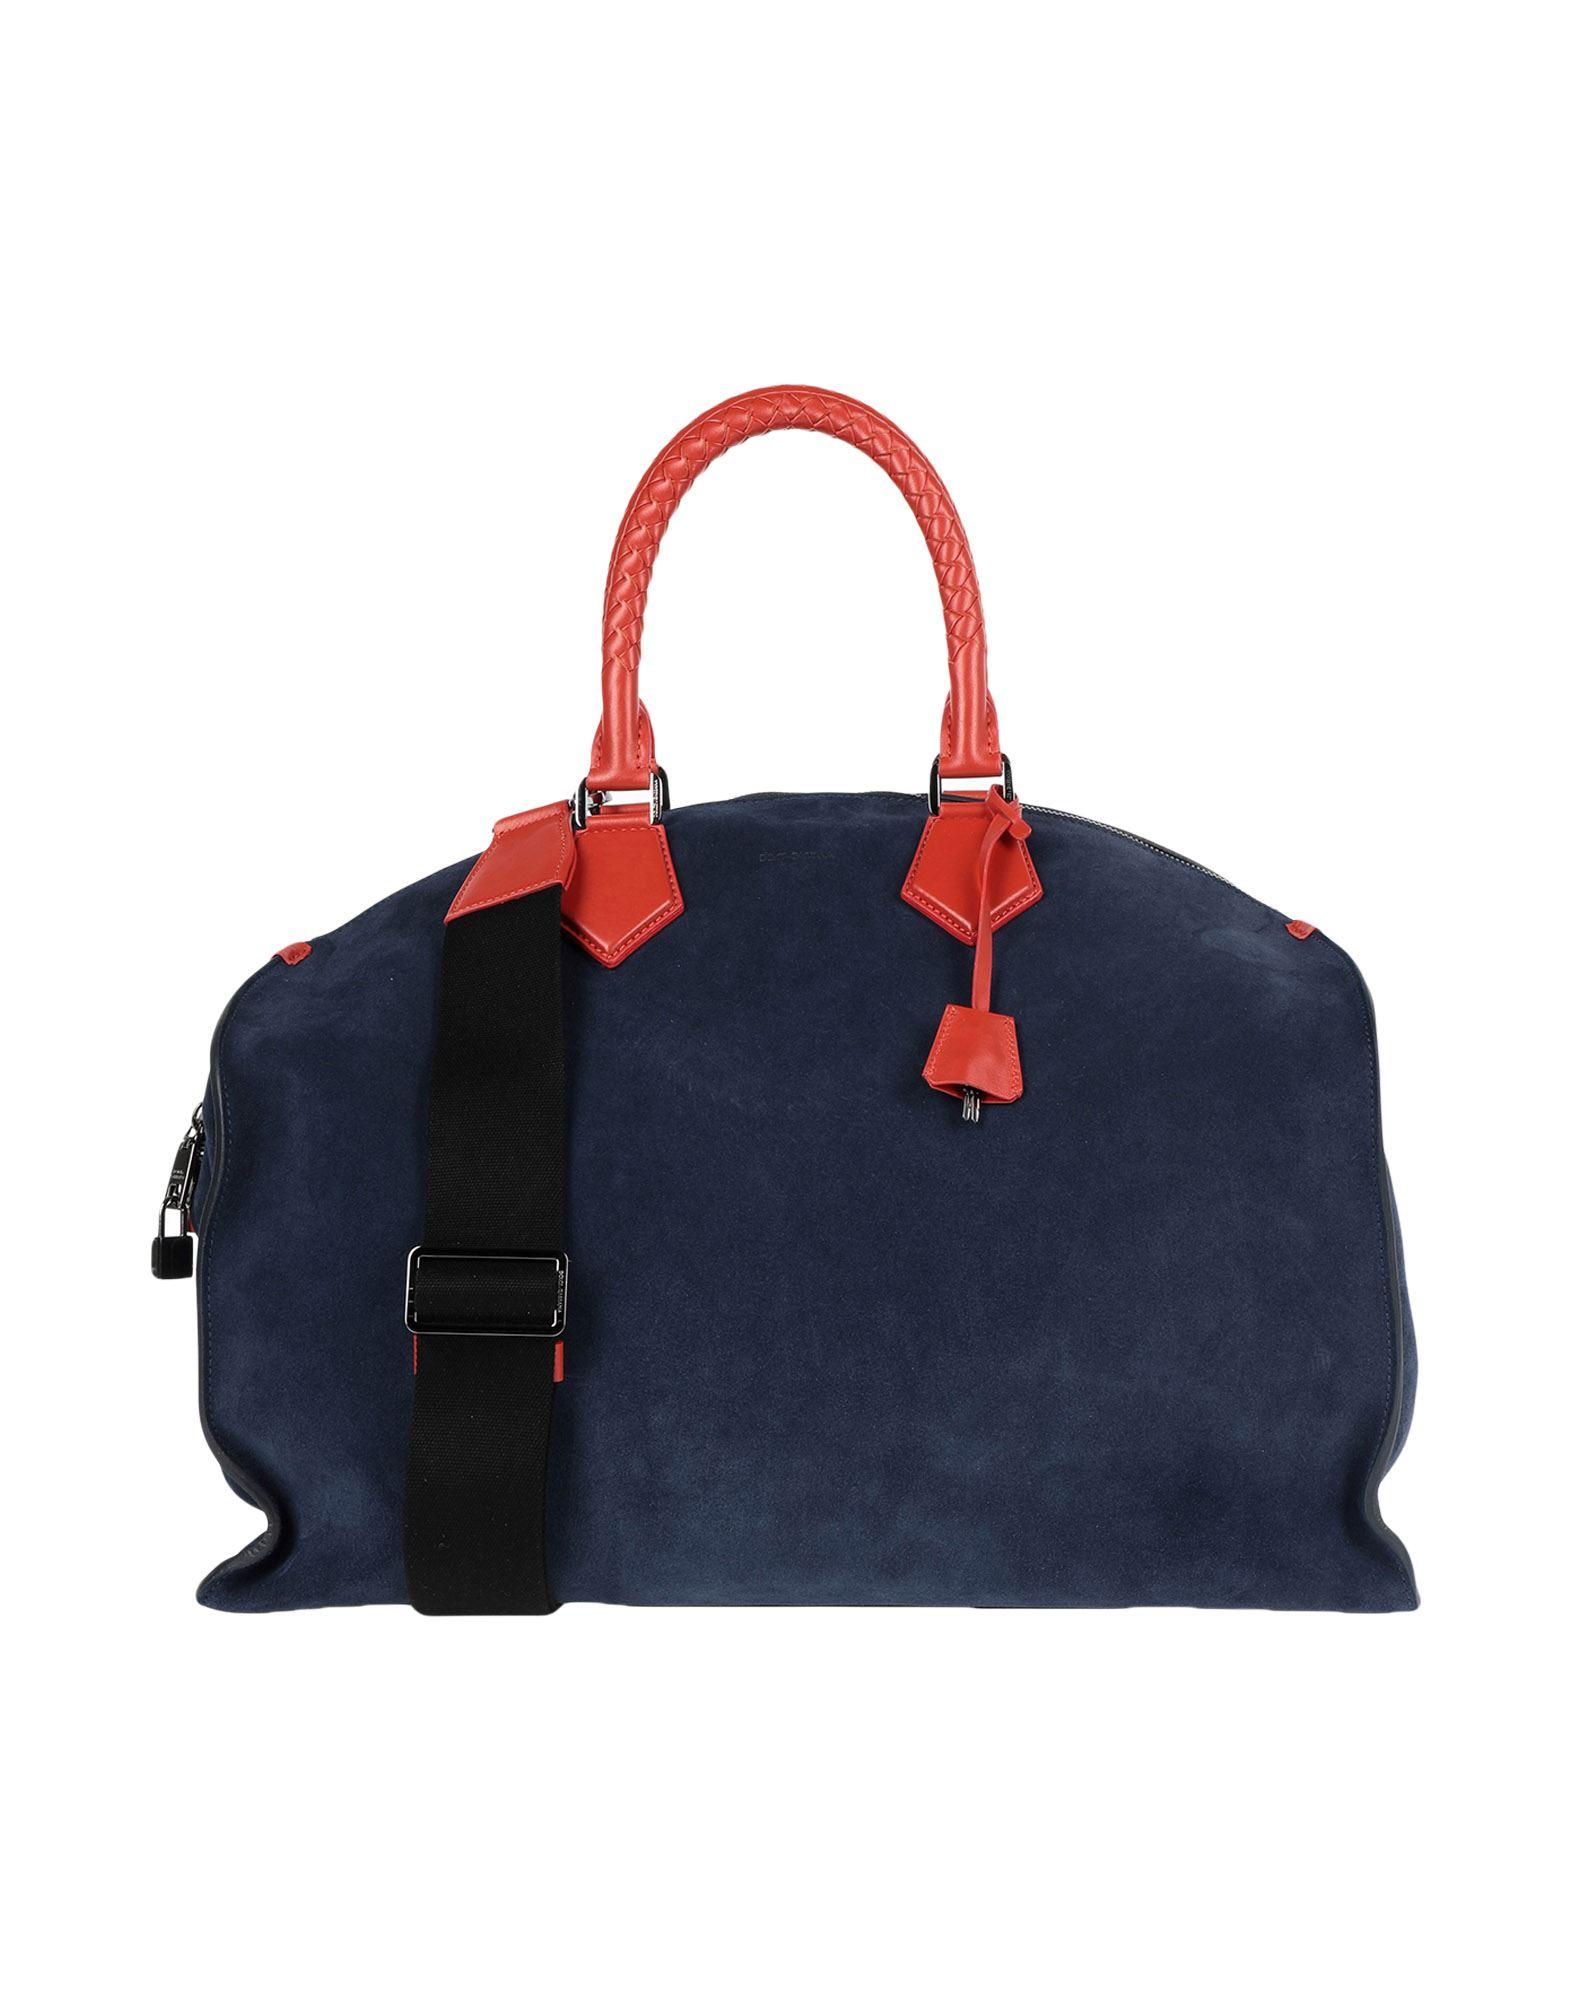 DOLCE & GABBANA Travel duffel bags - Item 45576526